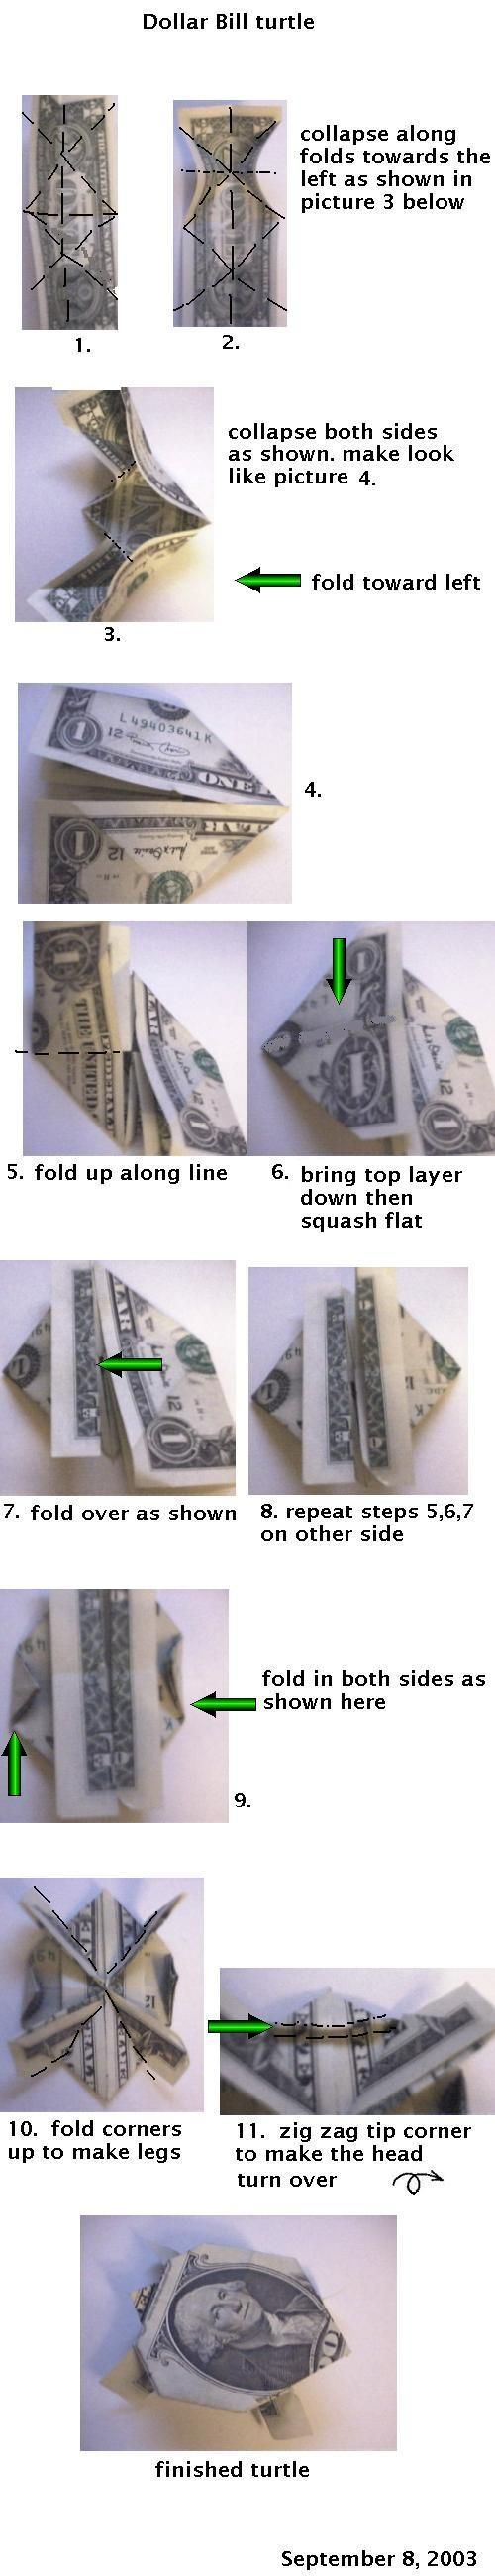 Origami money folding instructions cool ideas - Money Origami Turtle Casey